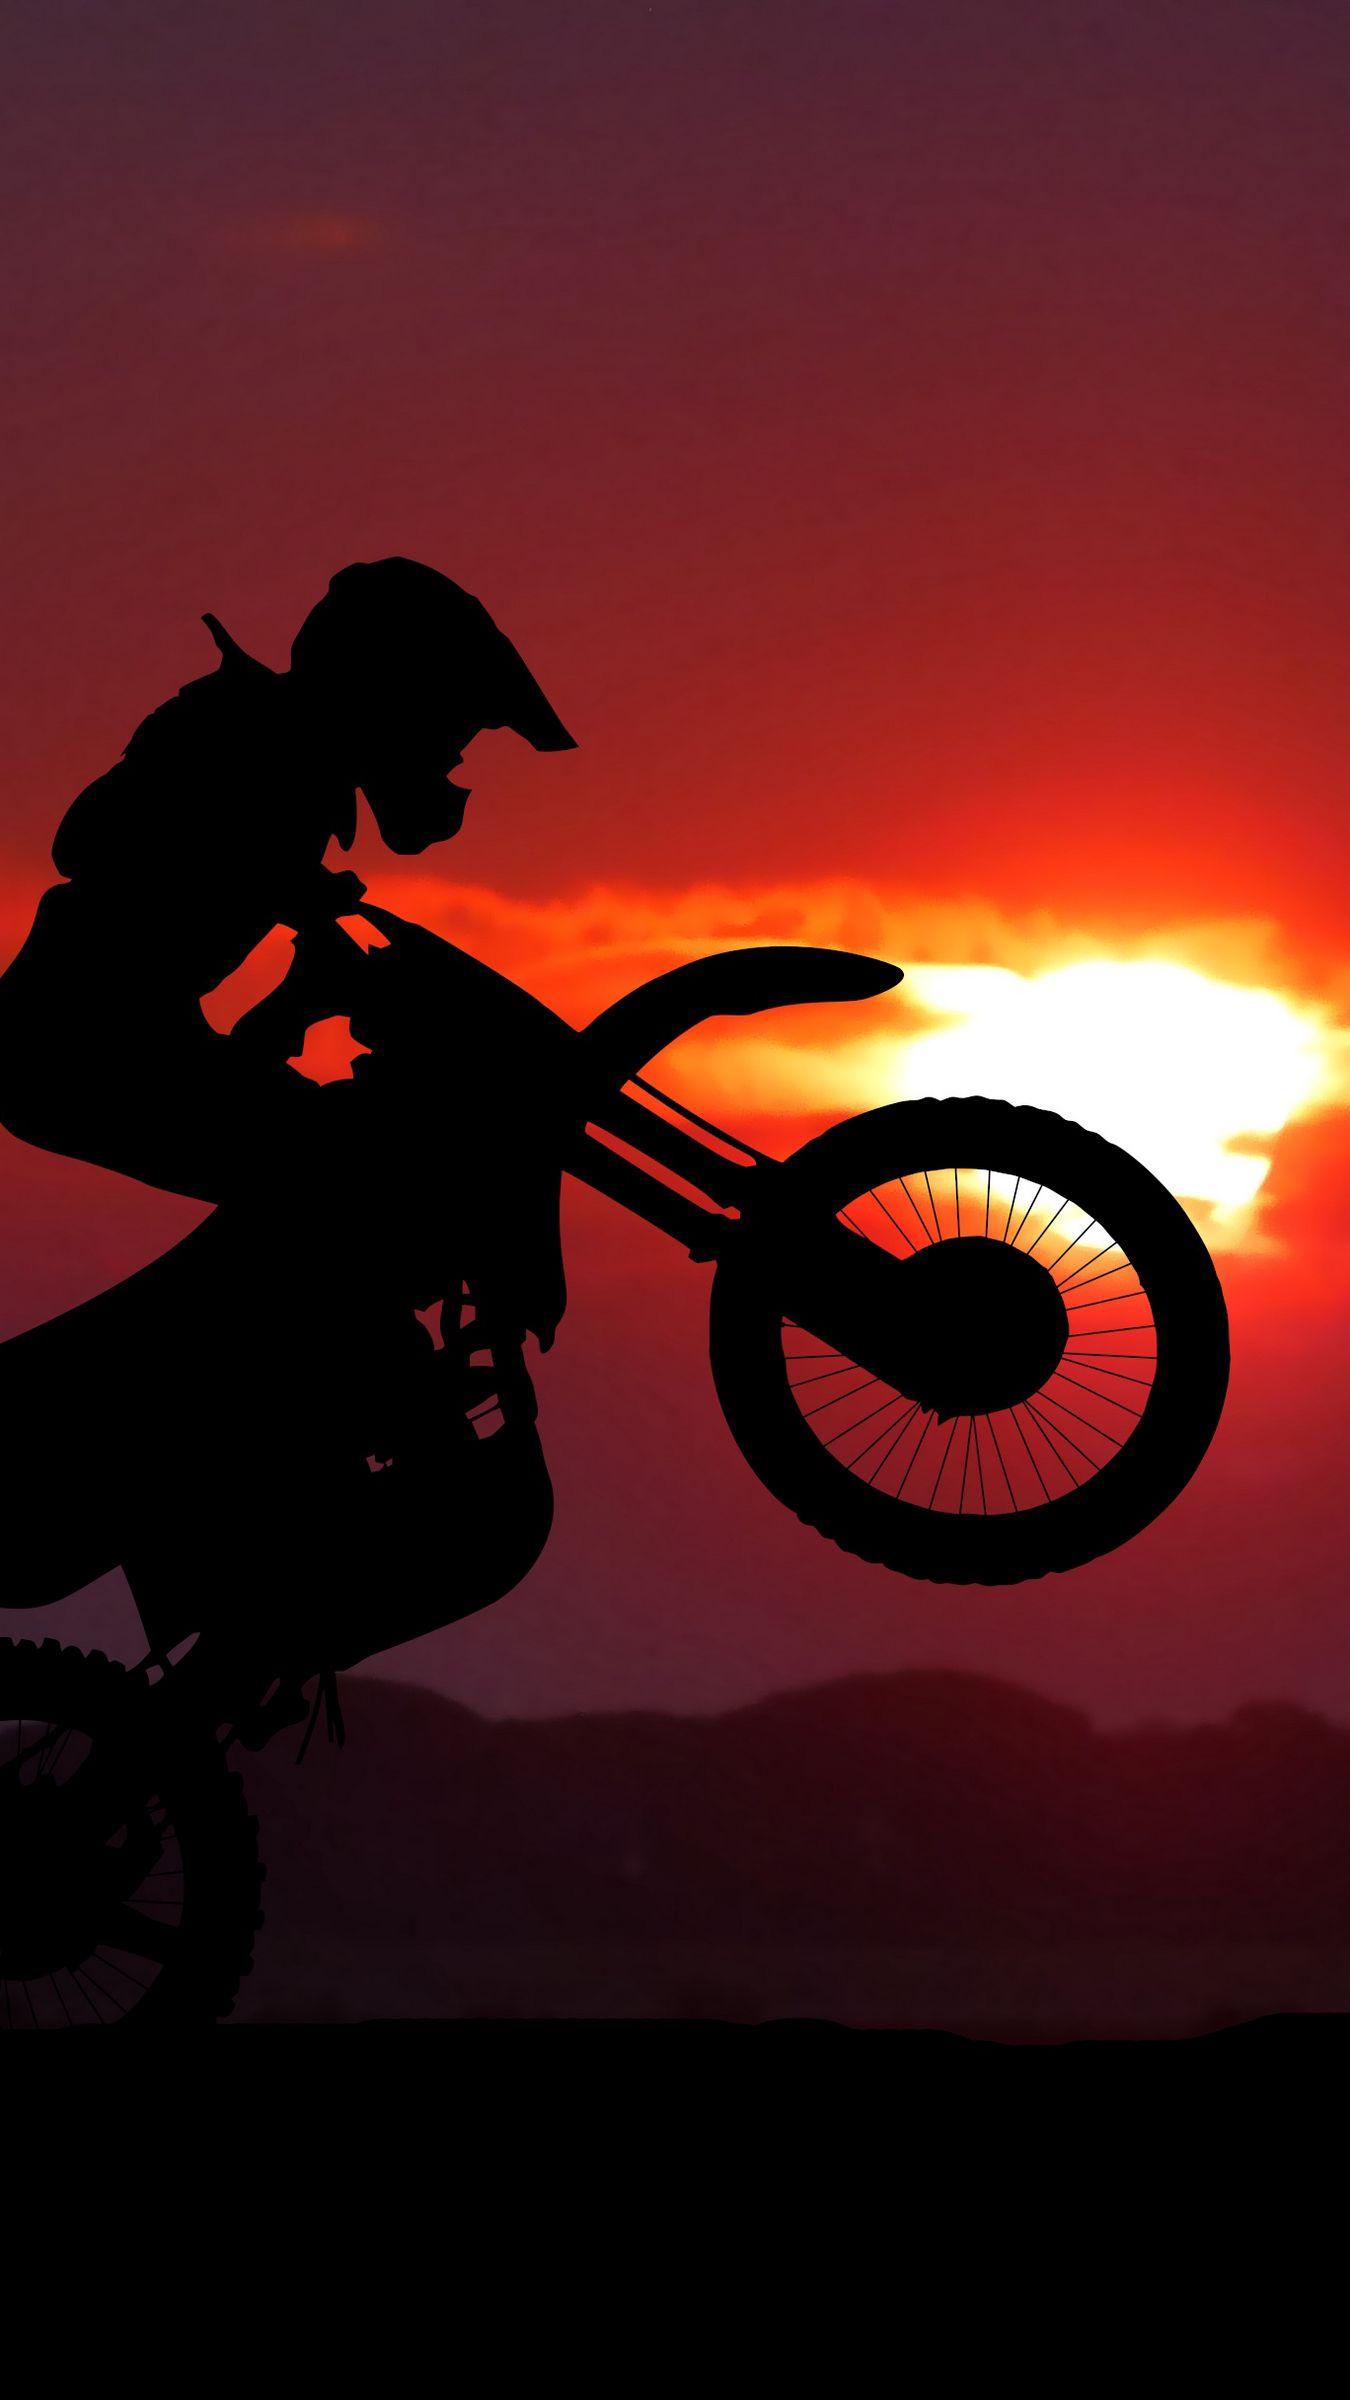 1350x2400 Wallpaper motorcycle, motorcyclist, cross, stunt, silhouette, sunset